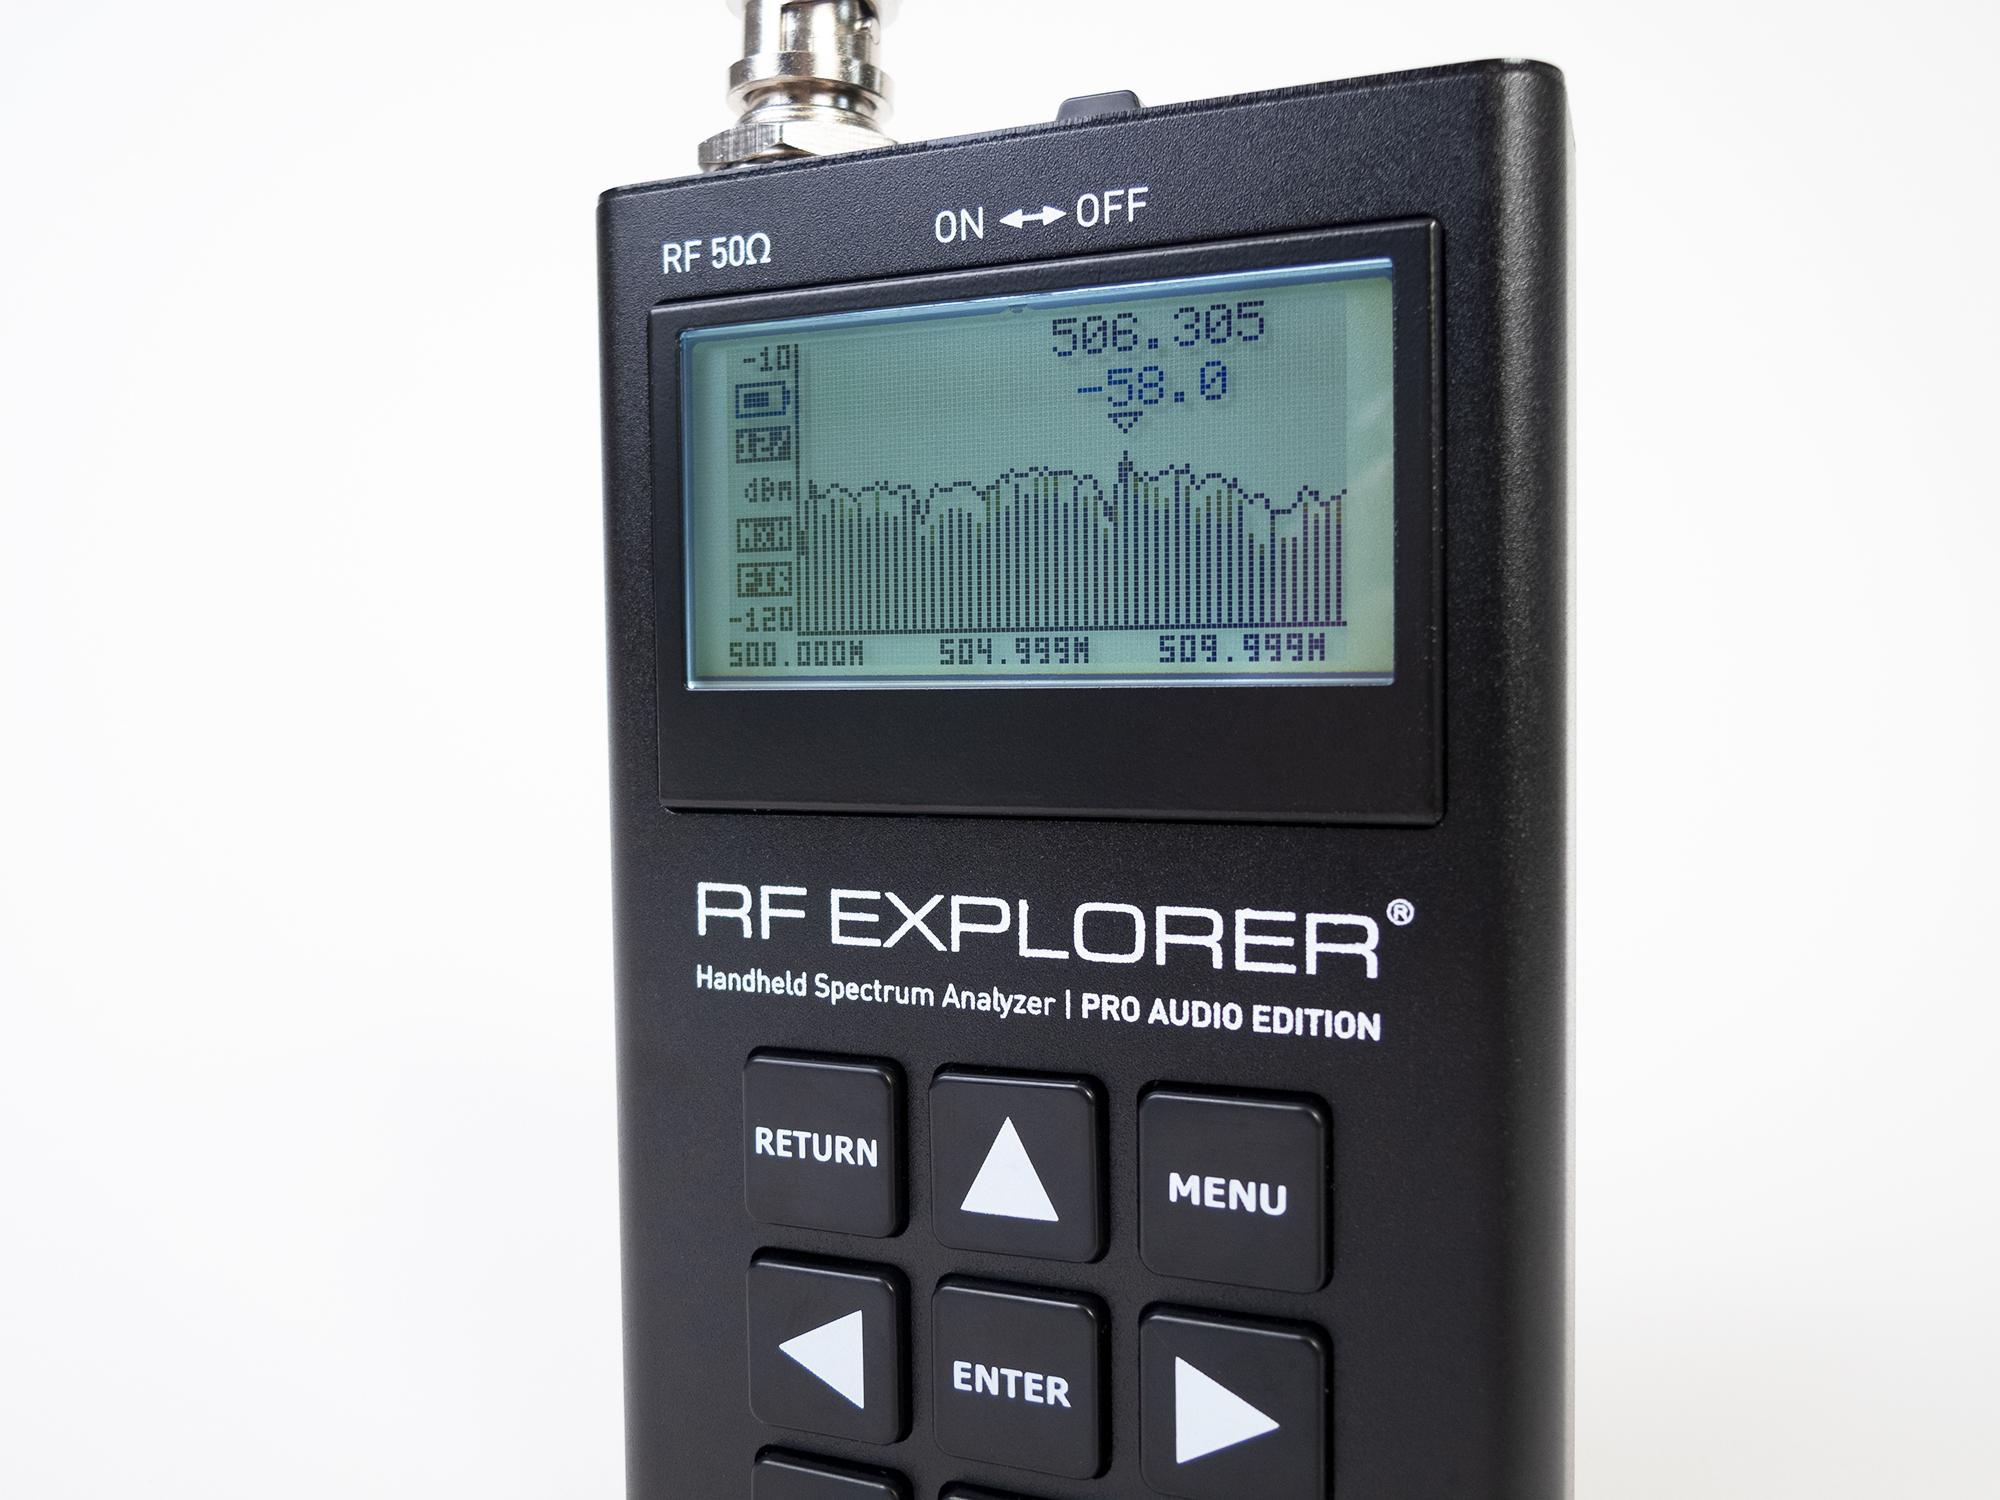 RF Explorer® Pro Audio Edition Spectrum Analyzer